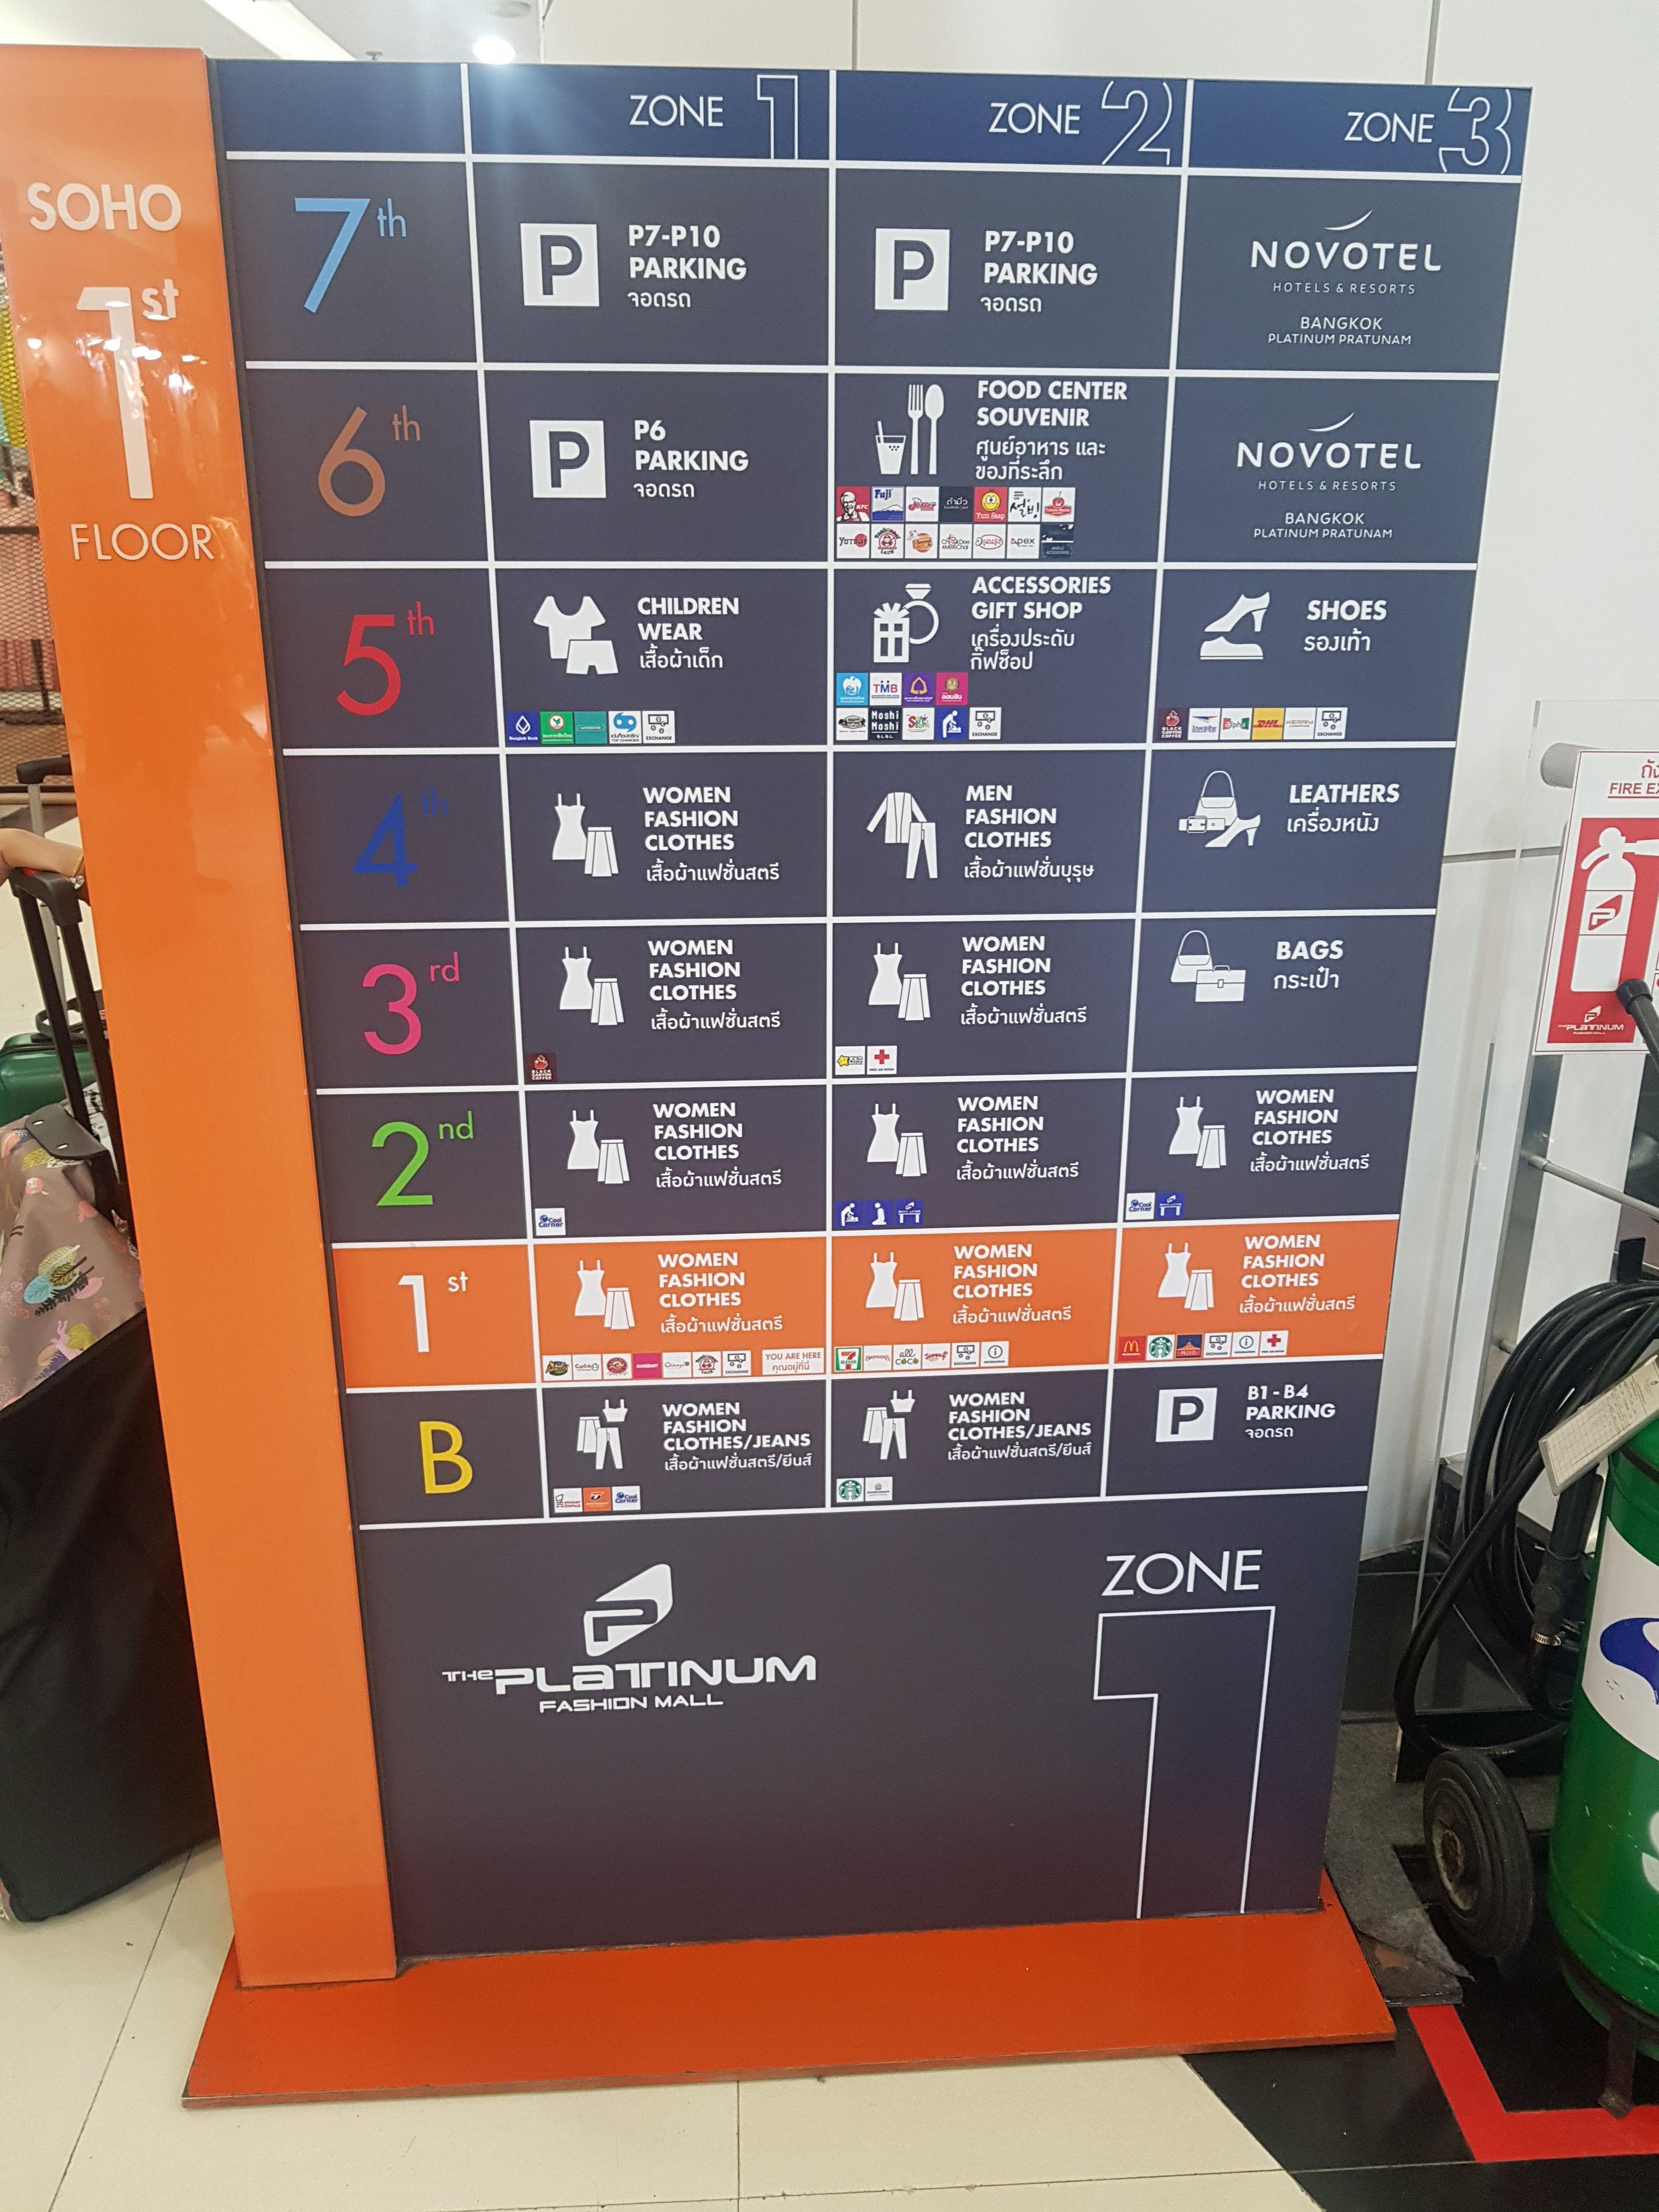 Platinum Mall Bangkok - Floor Plan